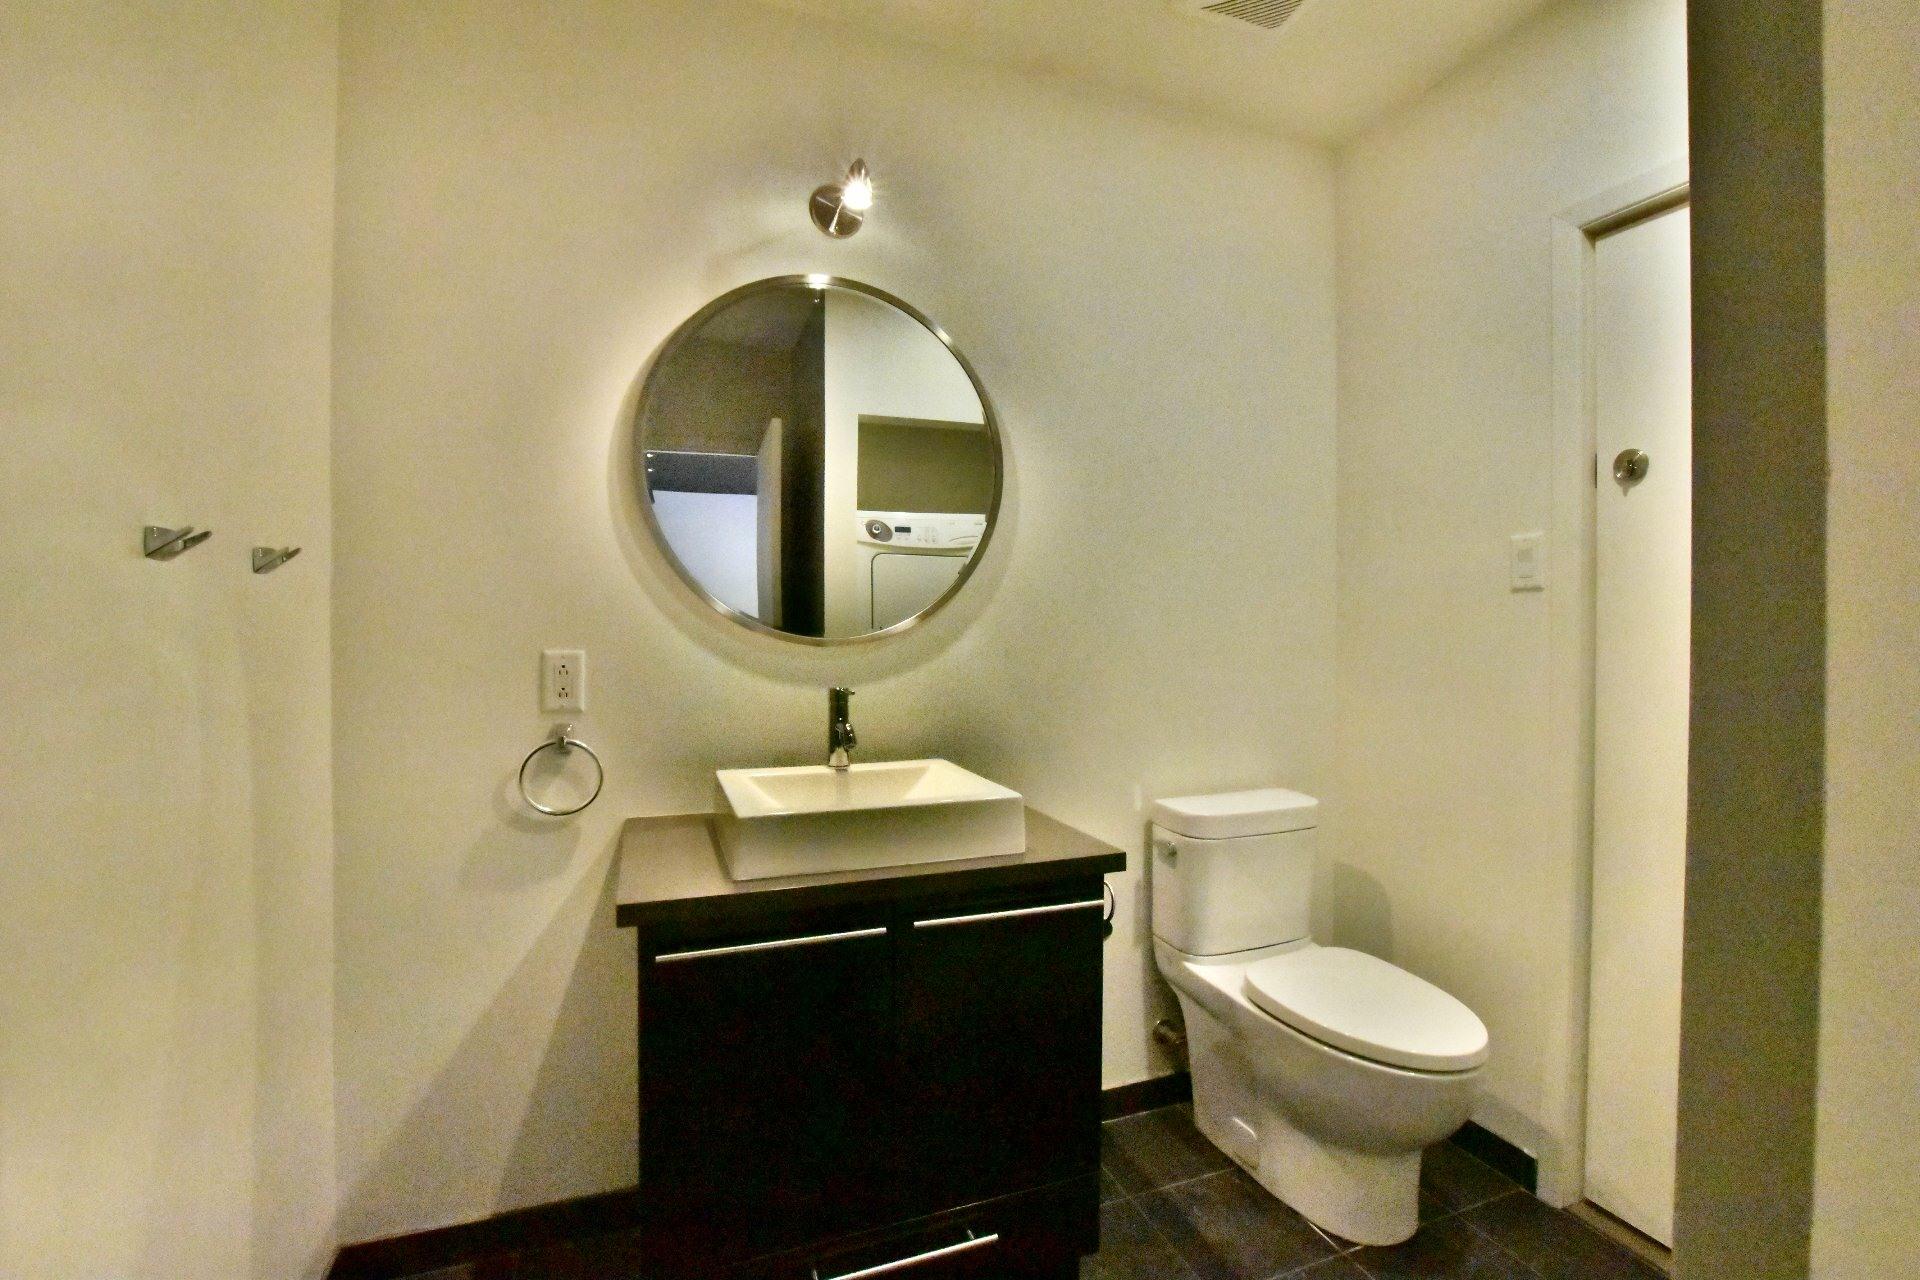 image 23 - Departamento Para alquiler Villeray/Saint-Michel/Parc-Extension Montréal  - 3 habitaciones